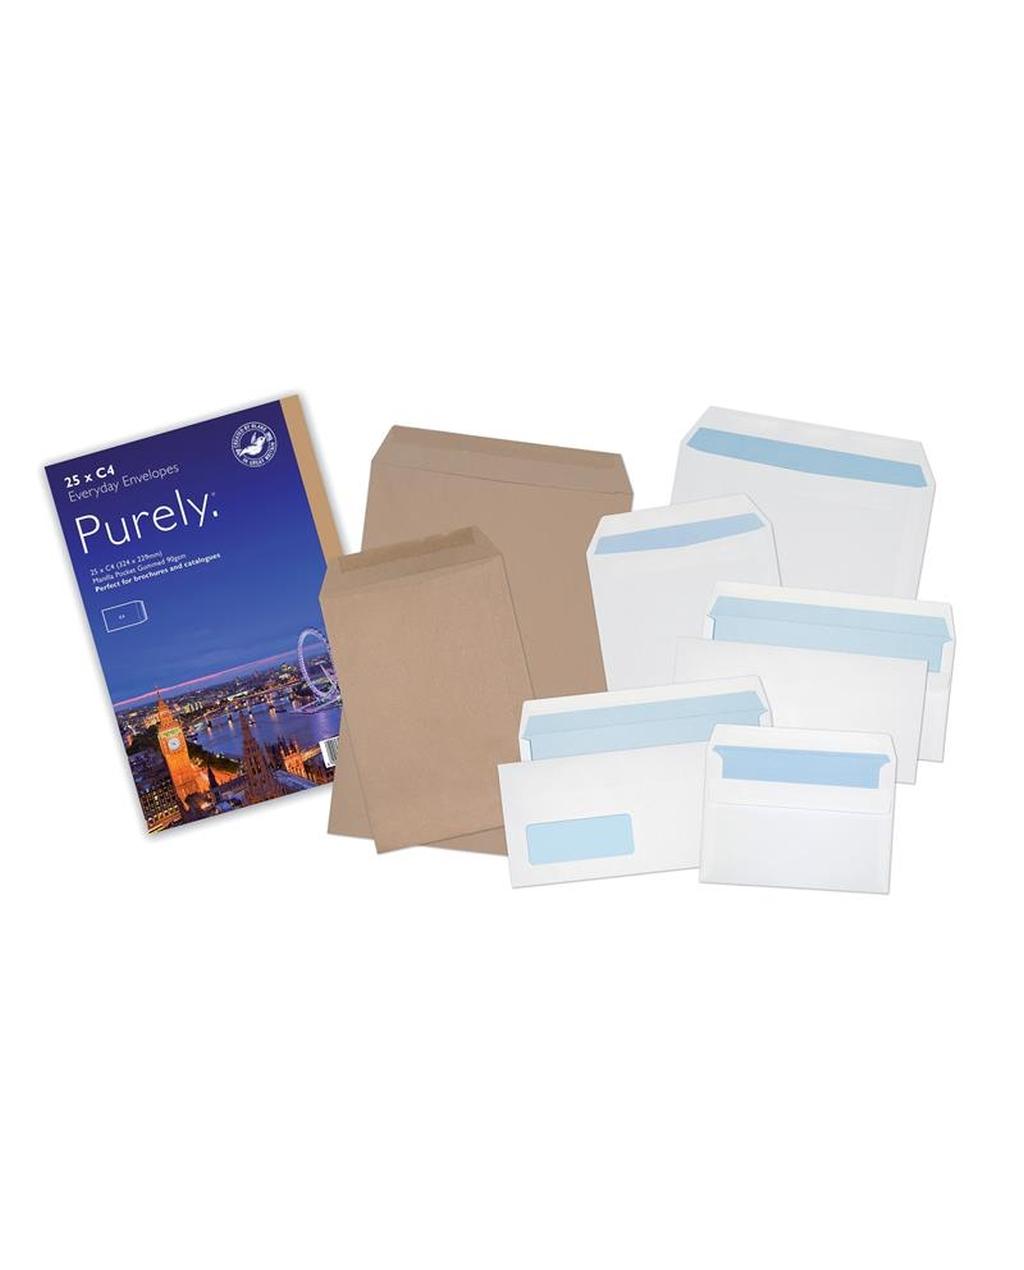 Assorted White & Manilla Envelopes